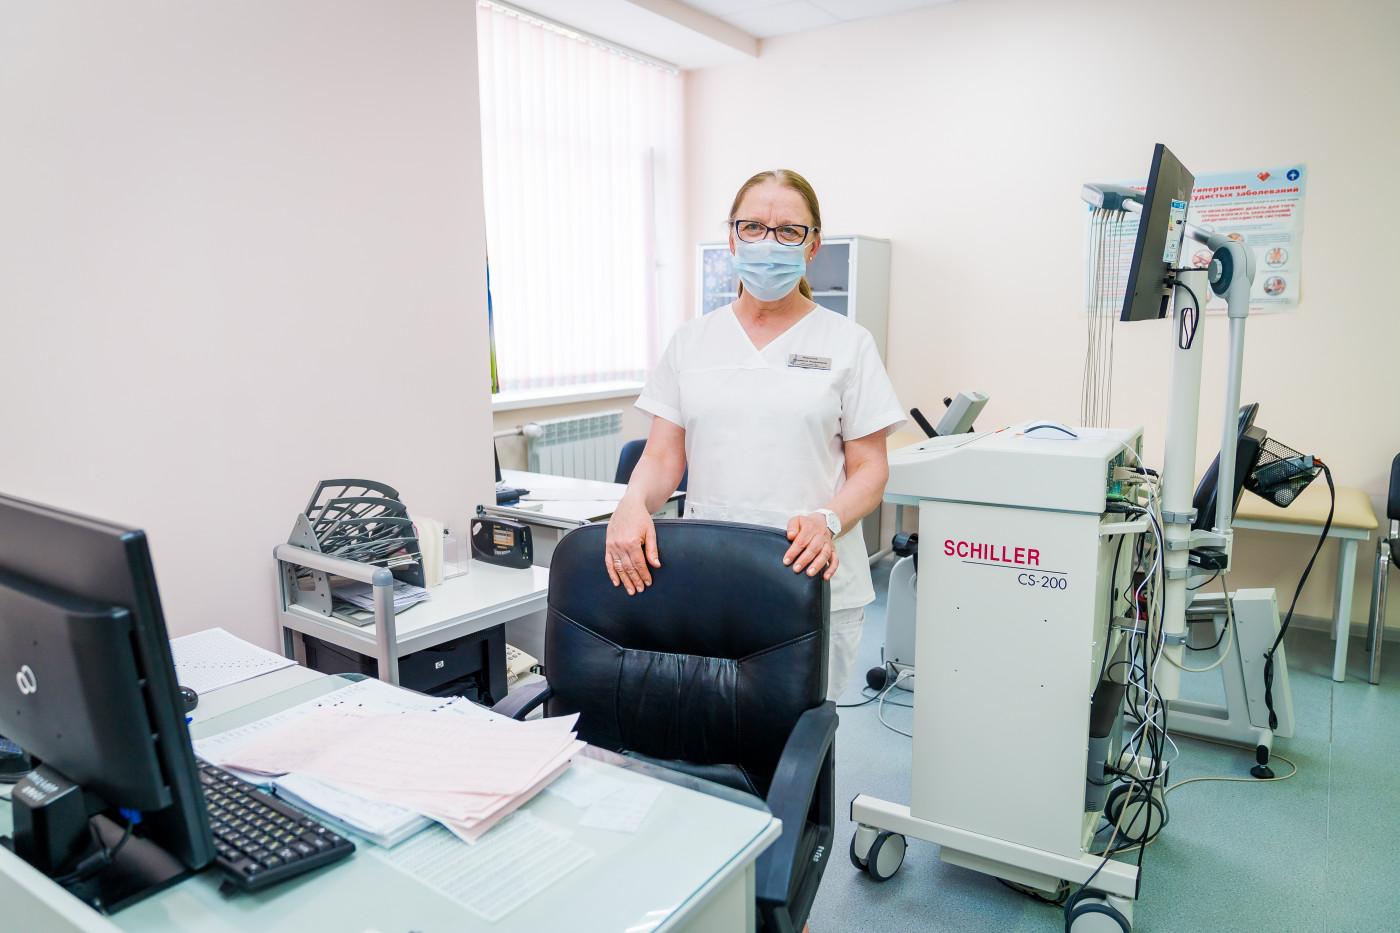 Для жителей Лангепаса будет открыта новая ПЦР-лаборатория